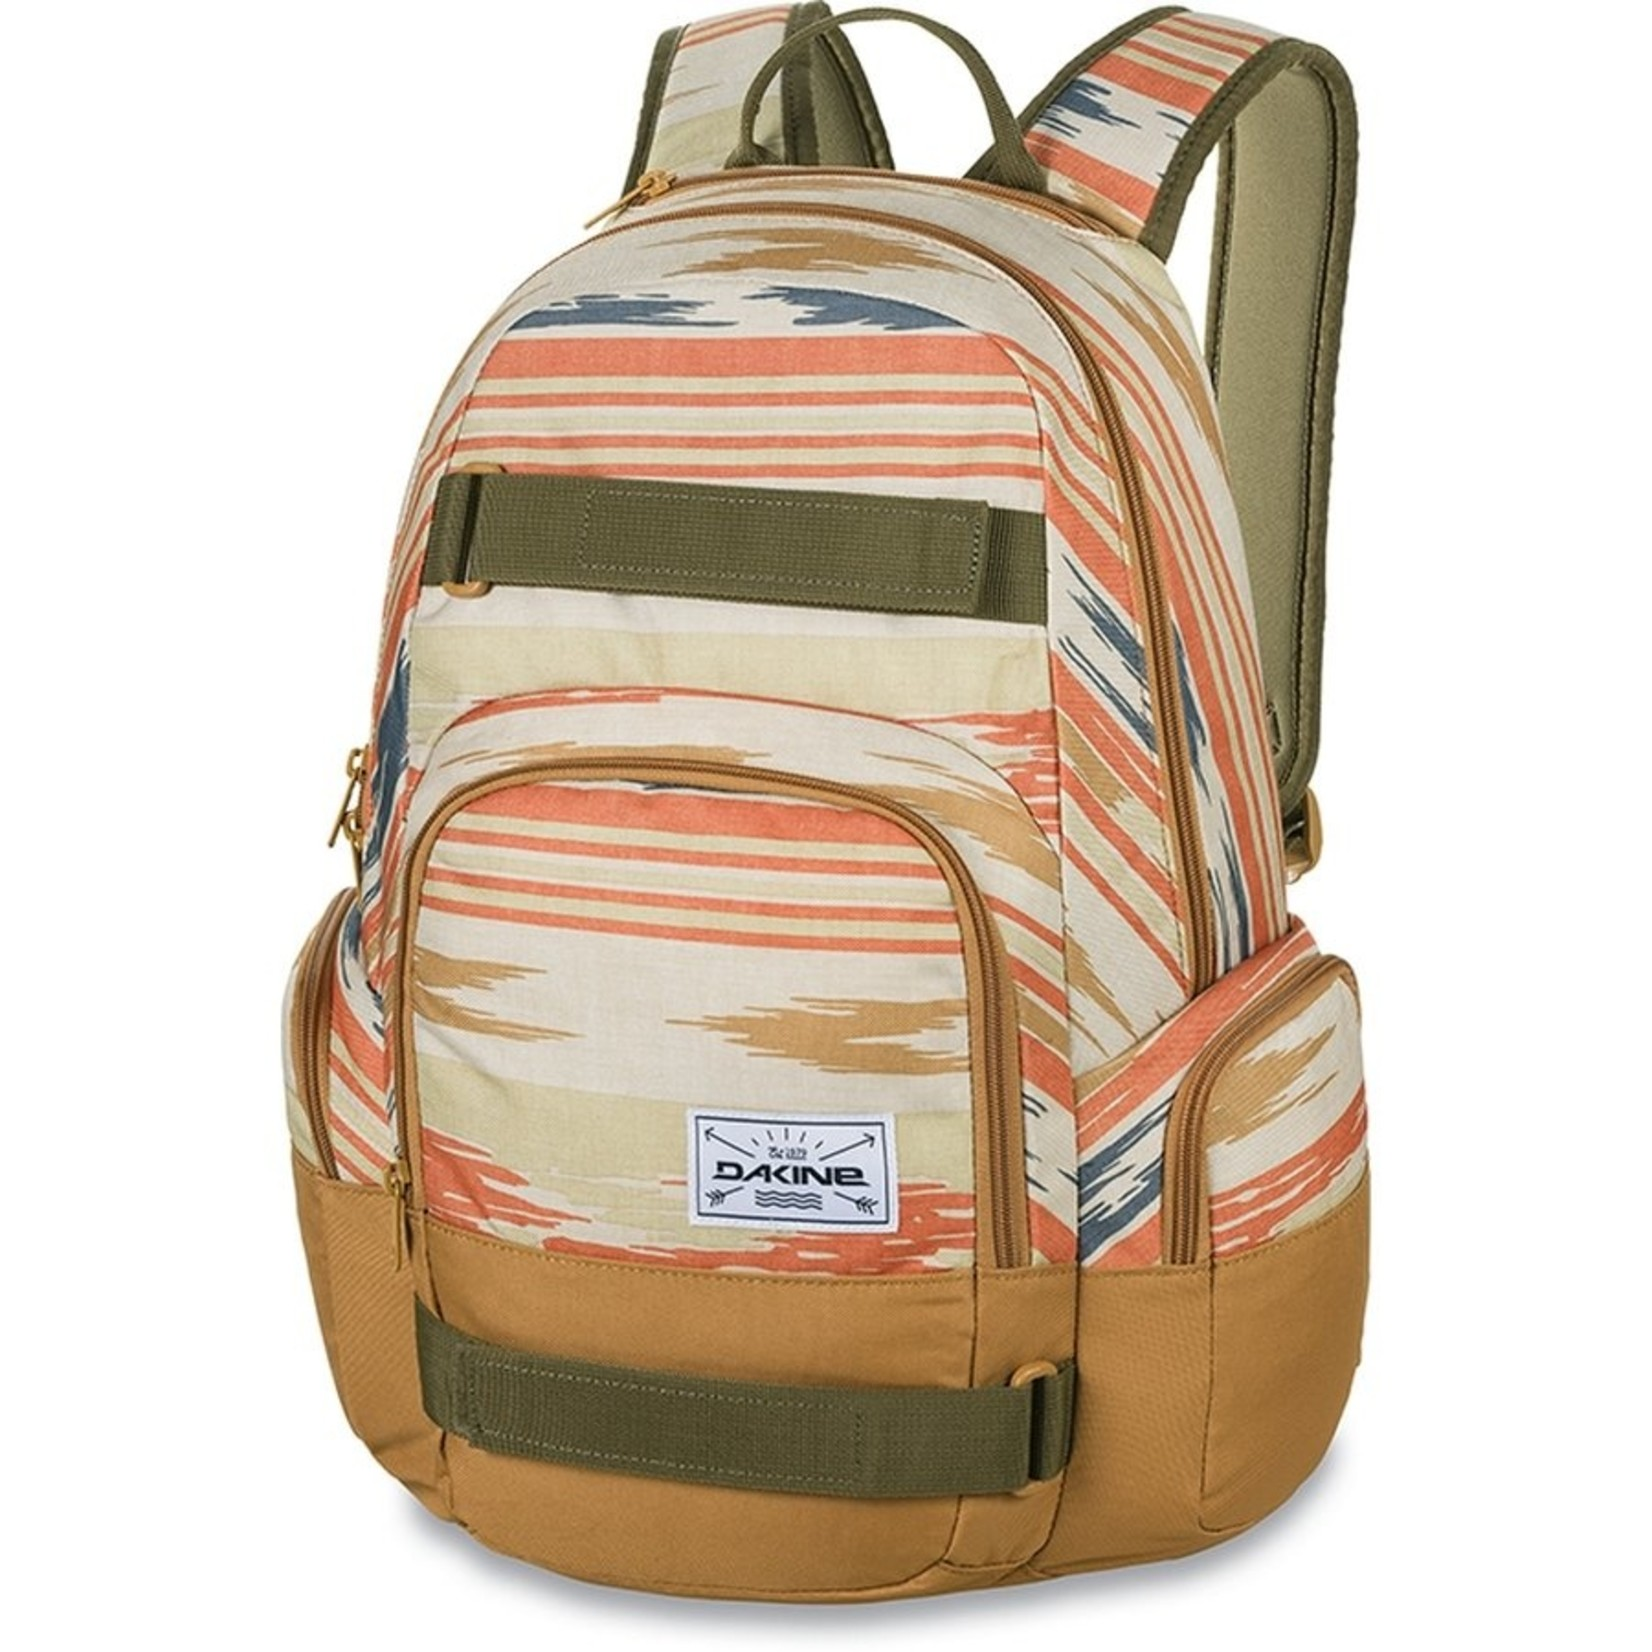 Dakine Dakine Atlas 25L Sandstone Backpack